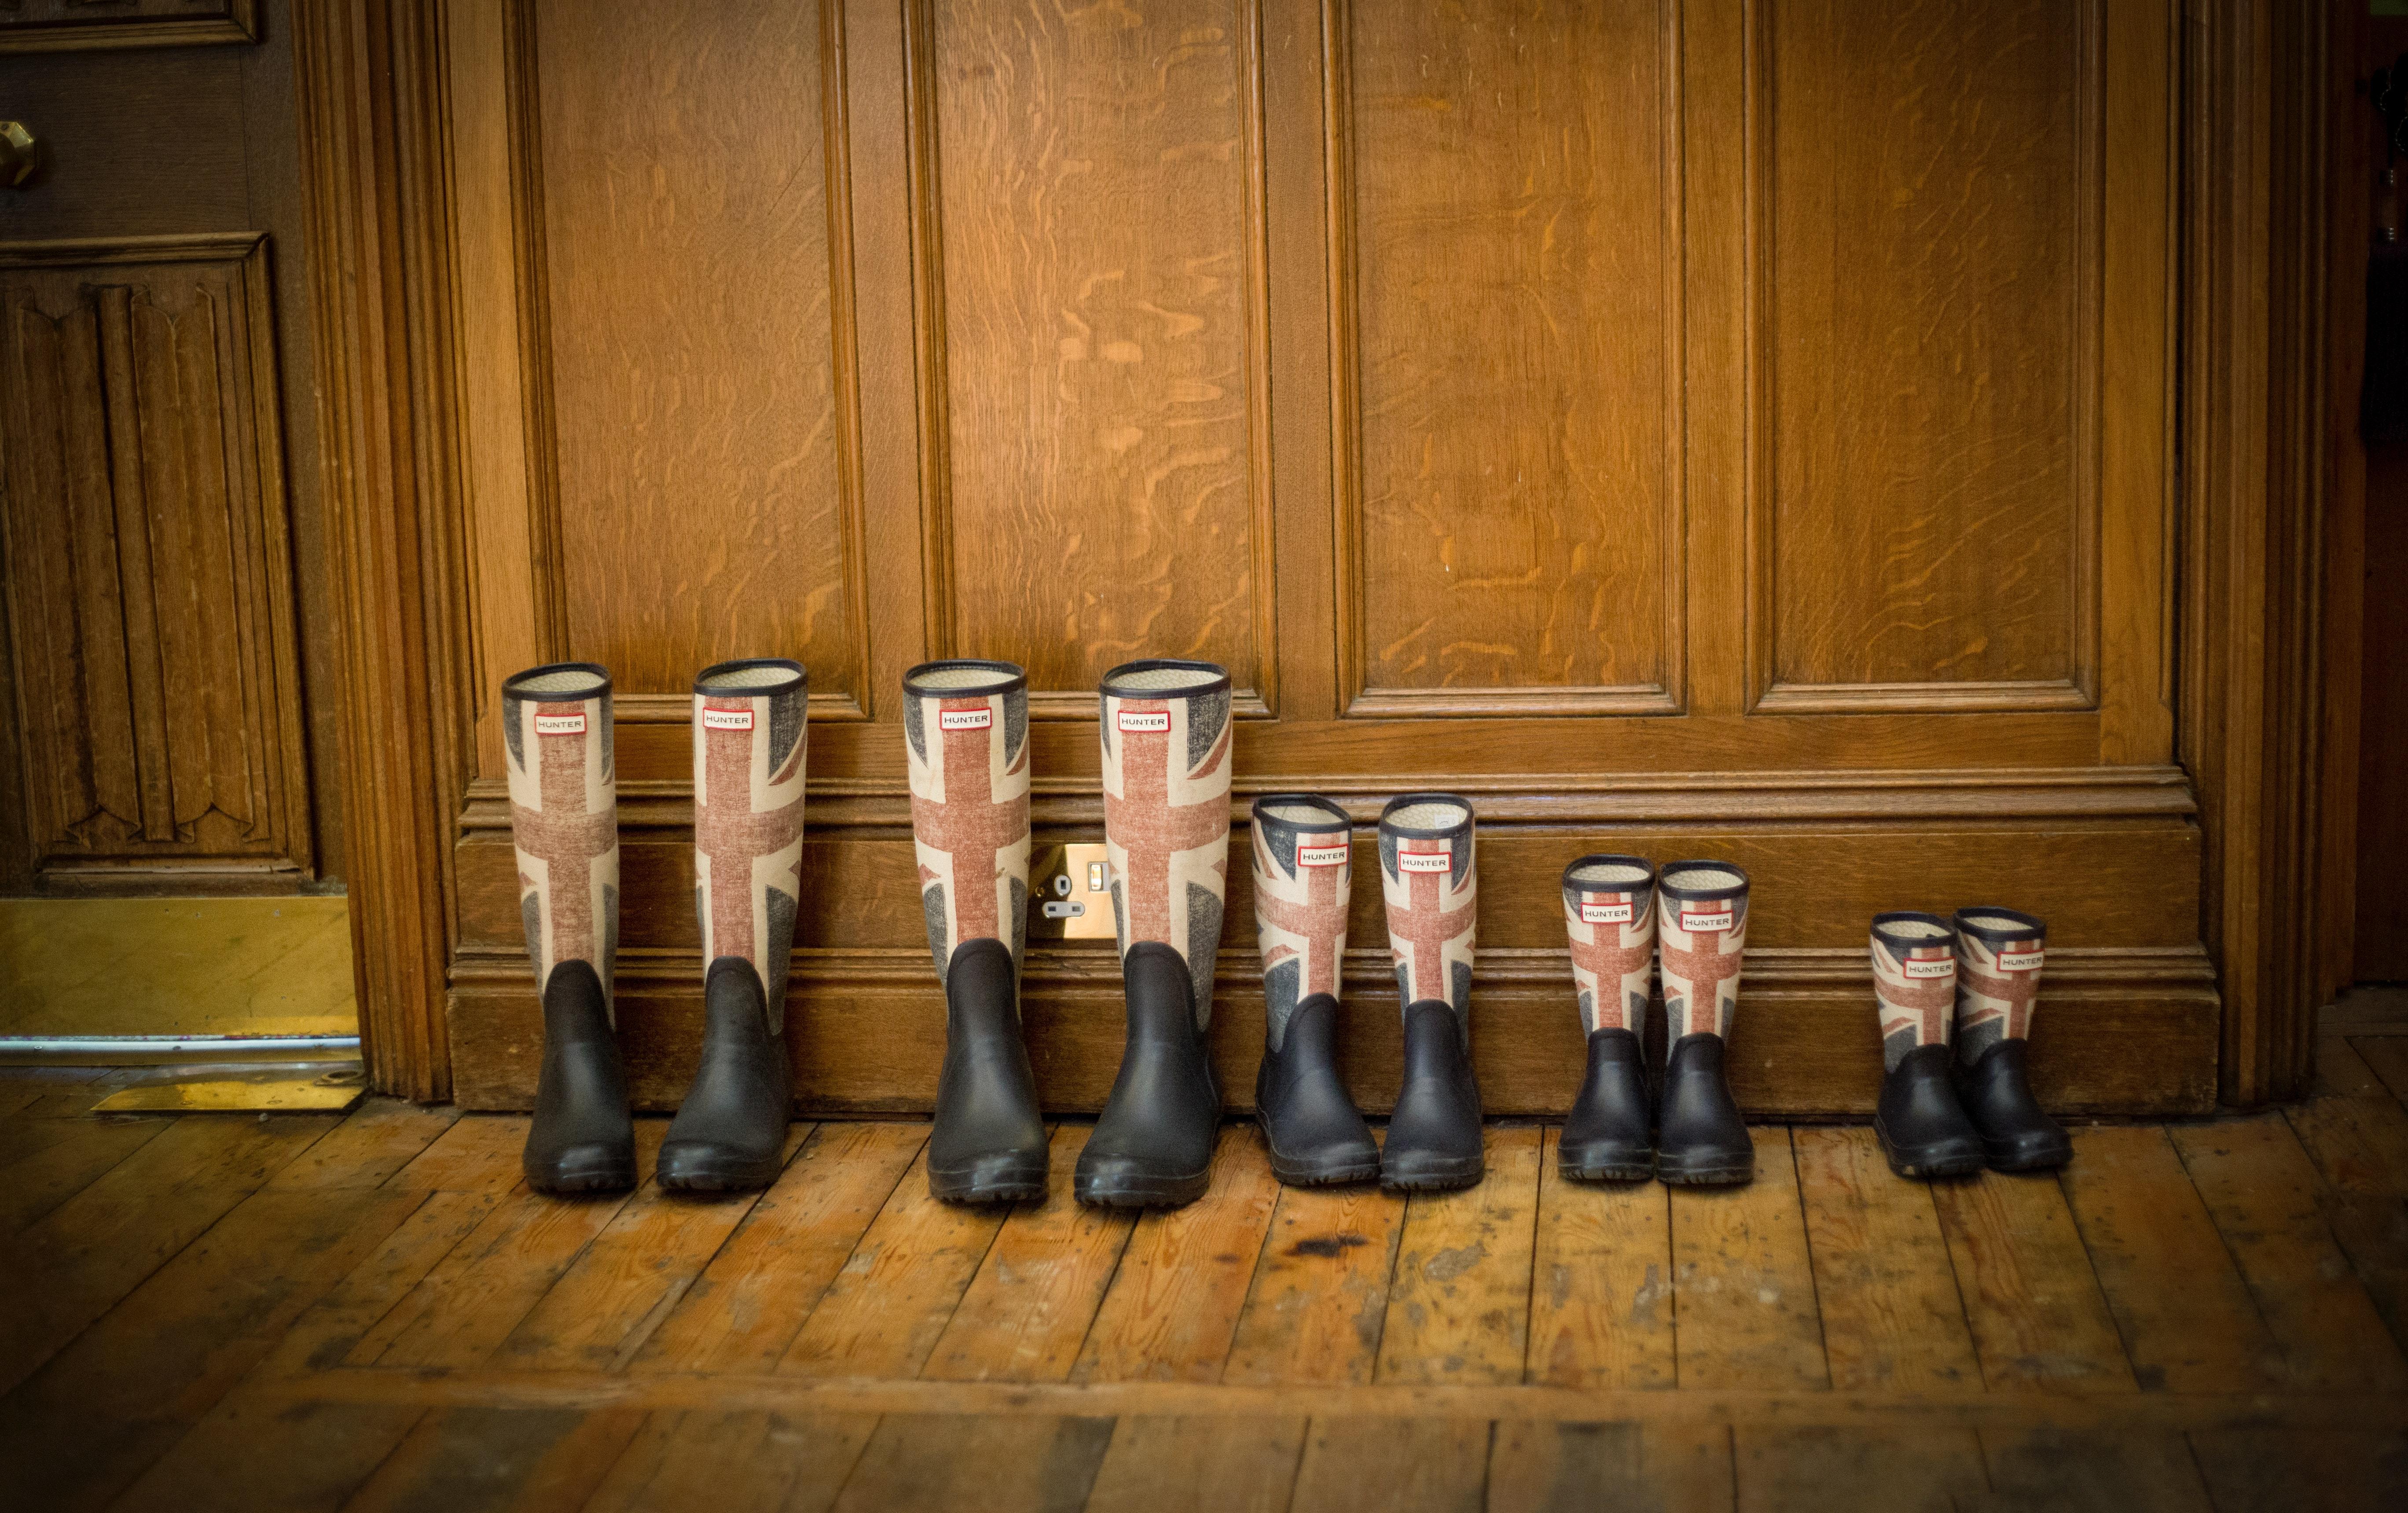 boots-footwear-indoors-parquet-165221